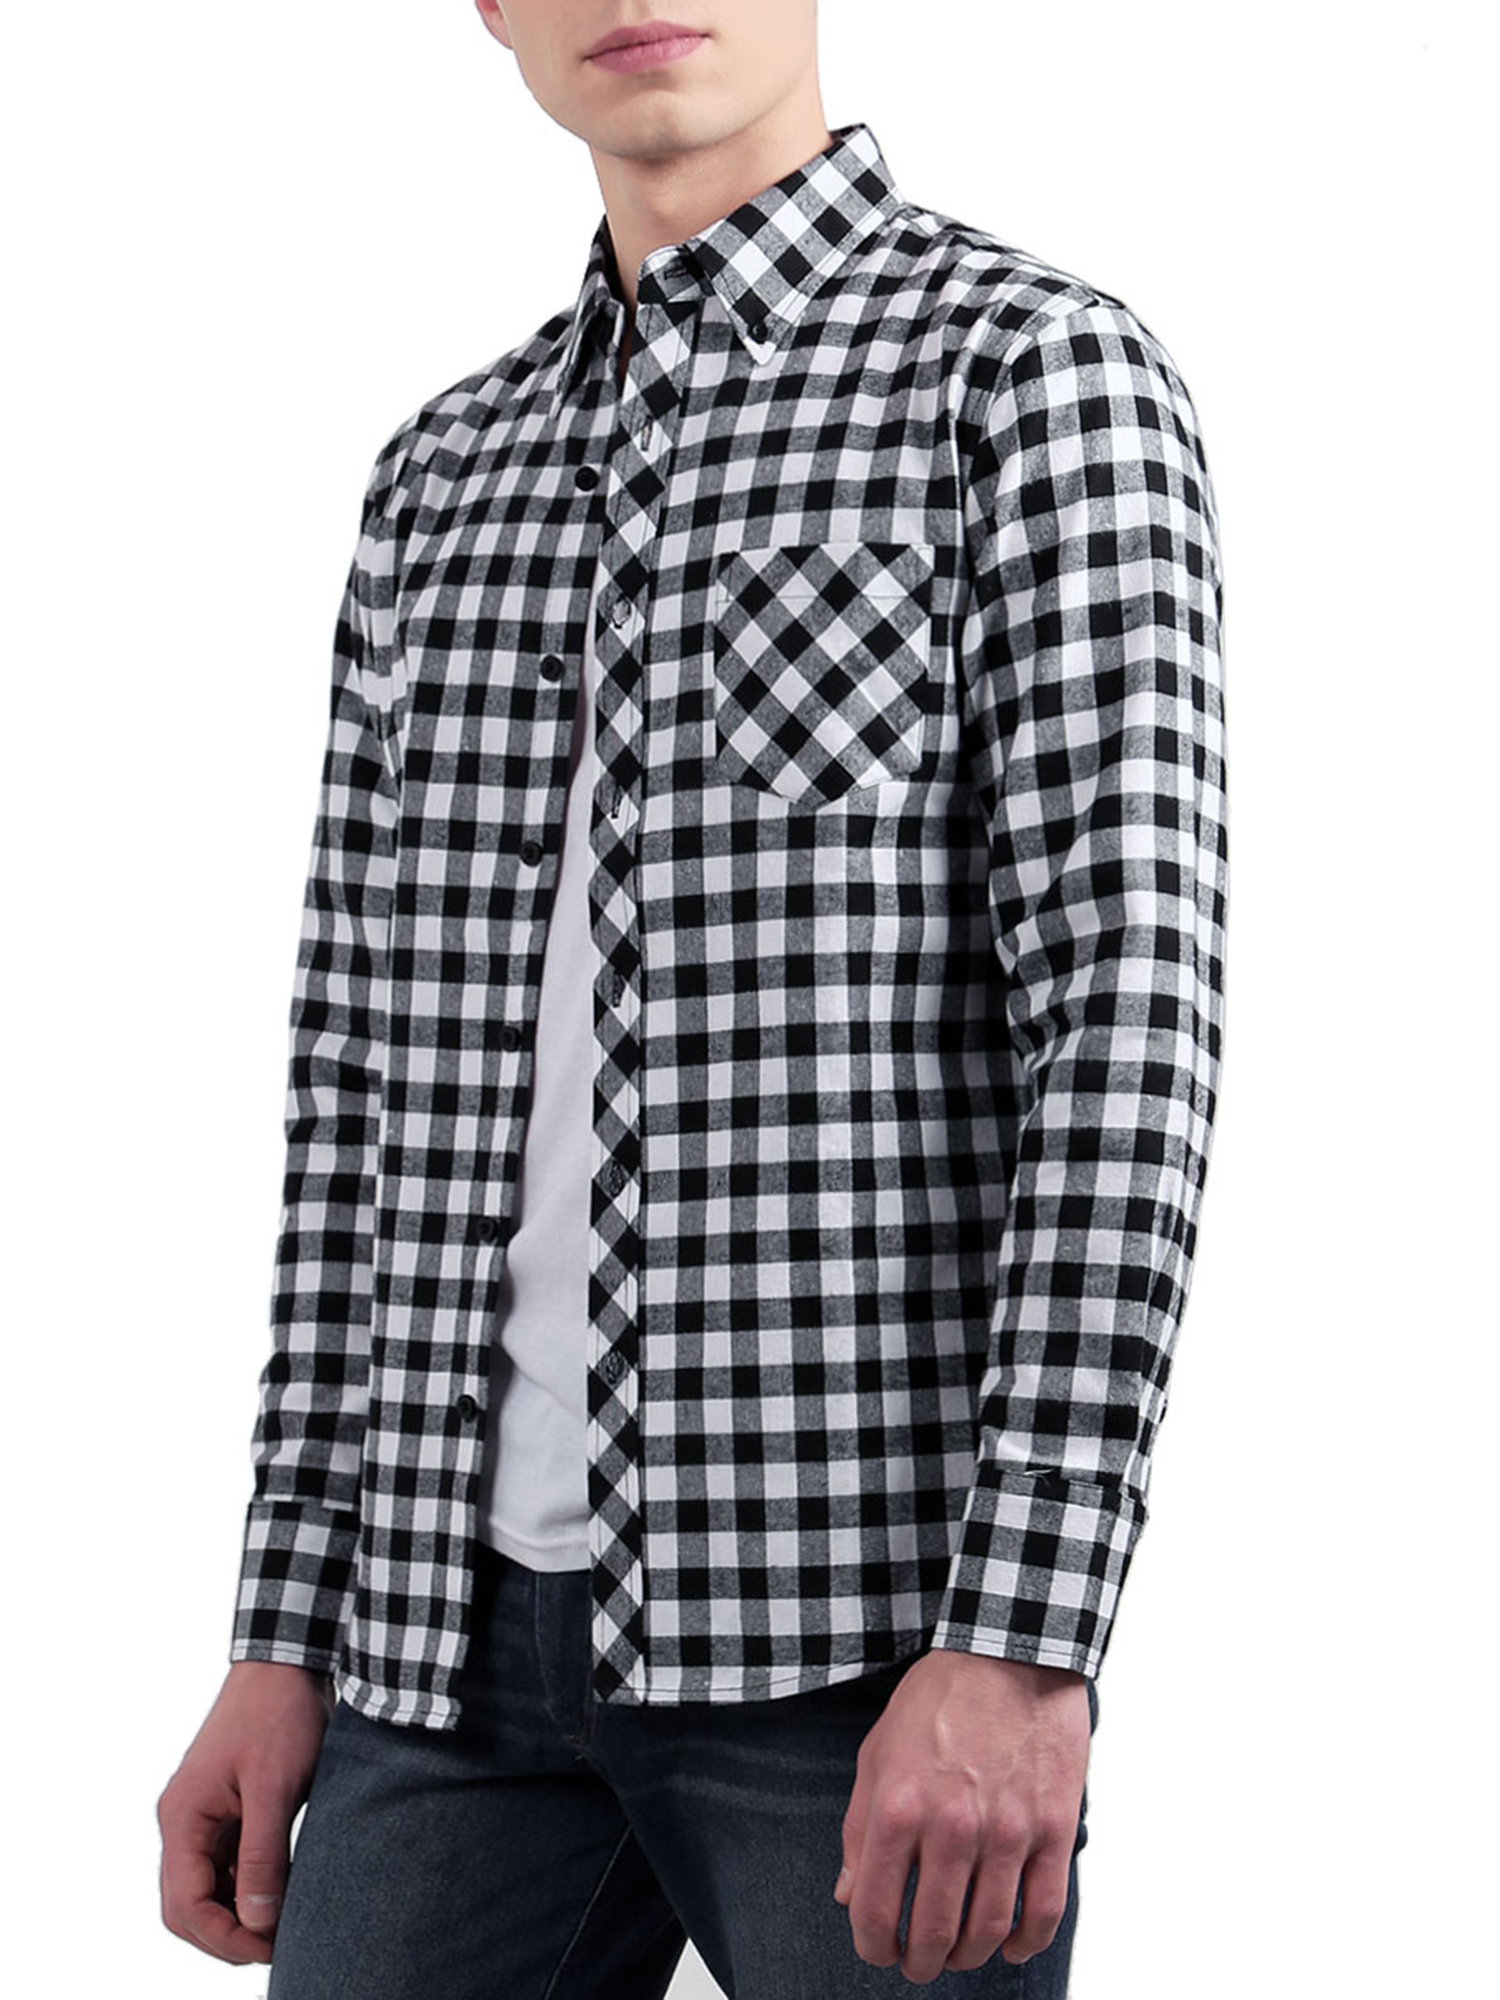 Men Point Collar Pocket Plaids Fannel Long Sleeves Button Down Shirt Black White L